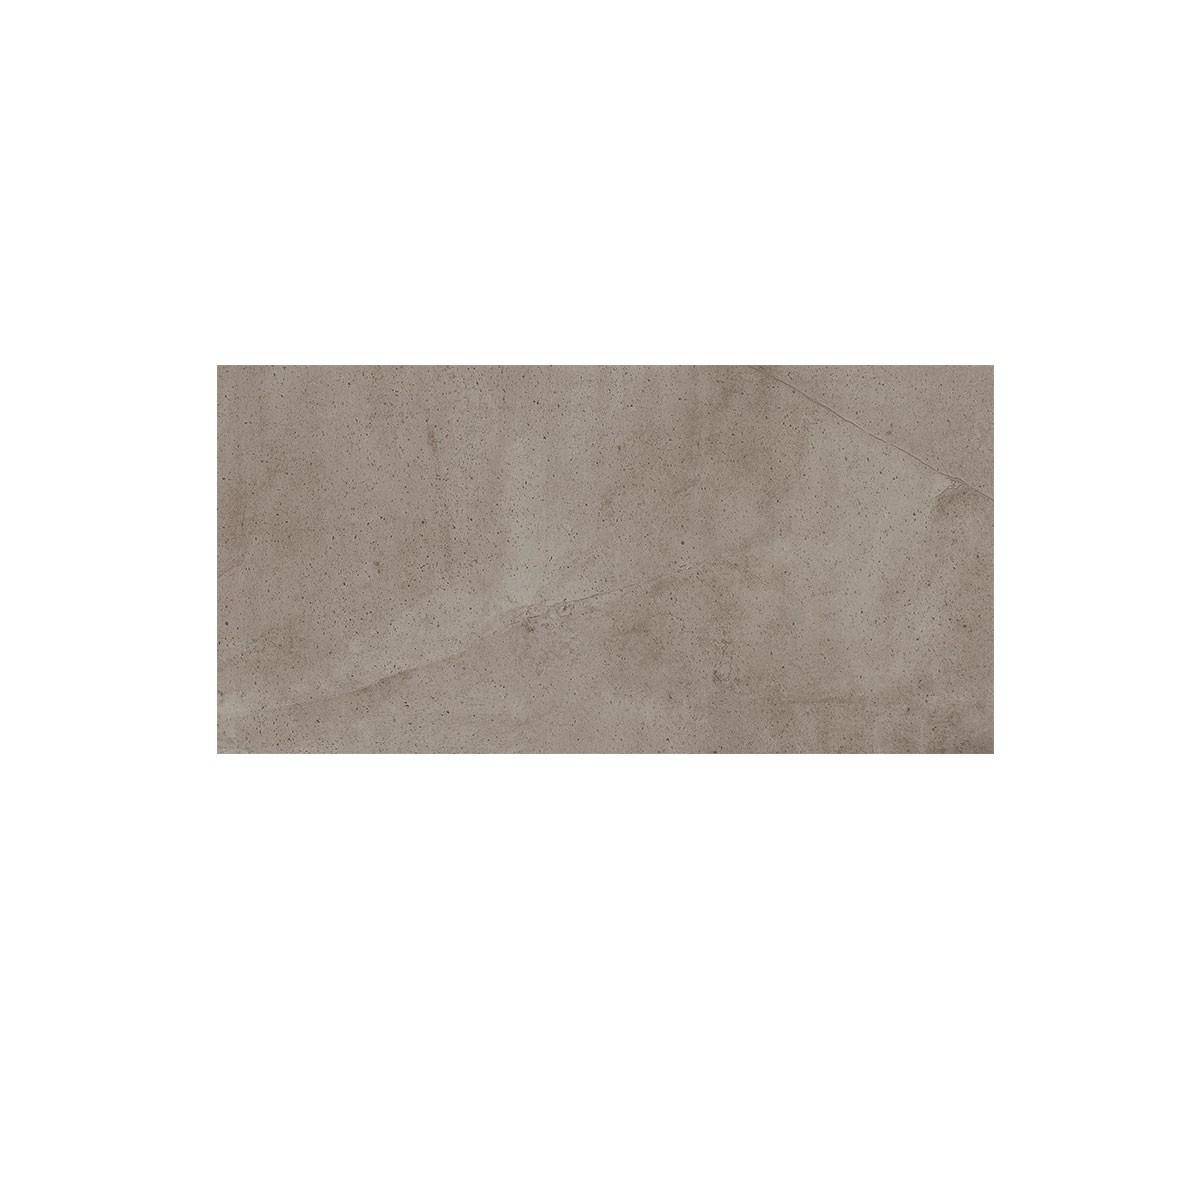 DECORAPORT NWS Wall Panel, Classic Stone, 4'' x6'' (NCS-01) (Sample)